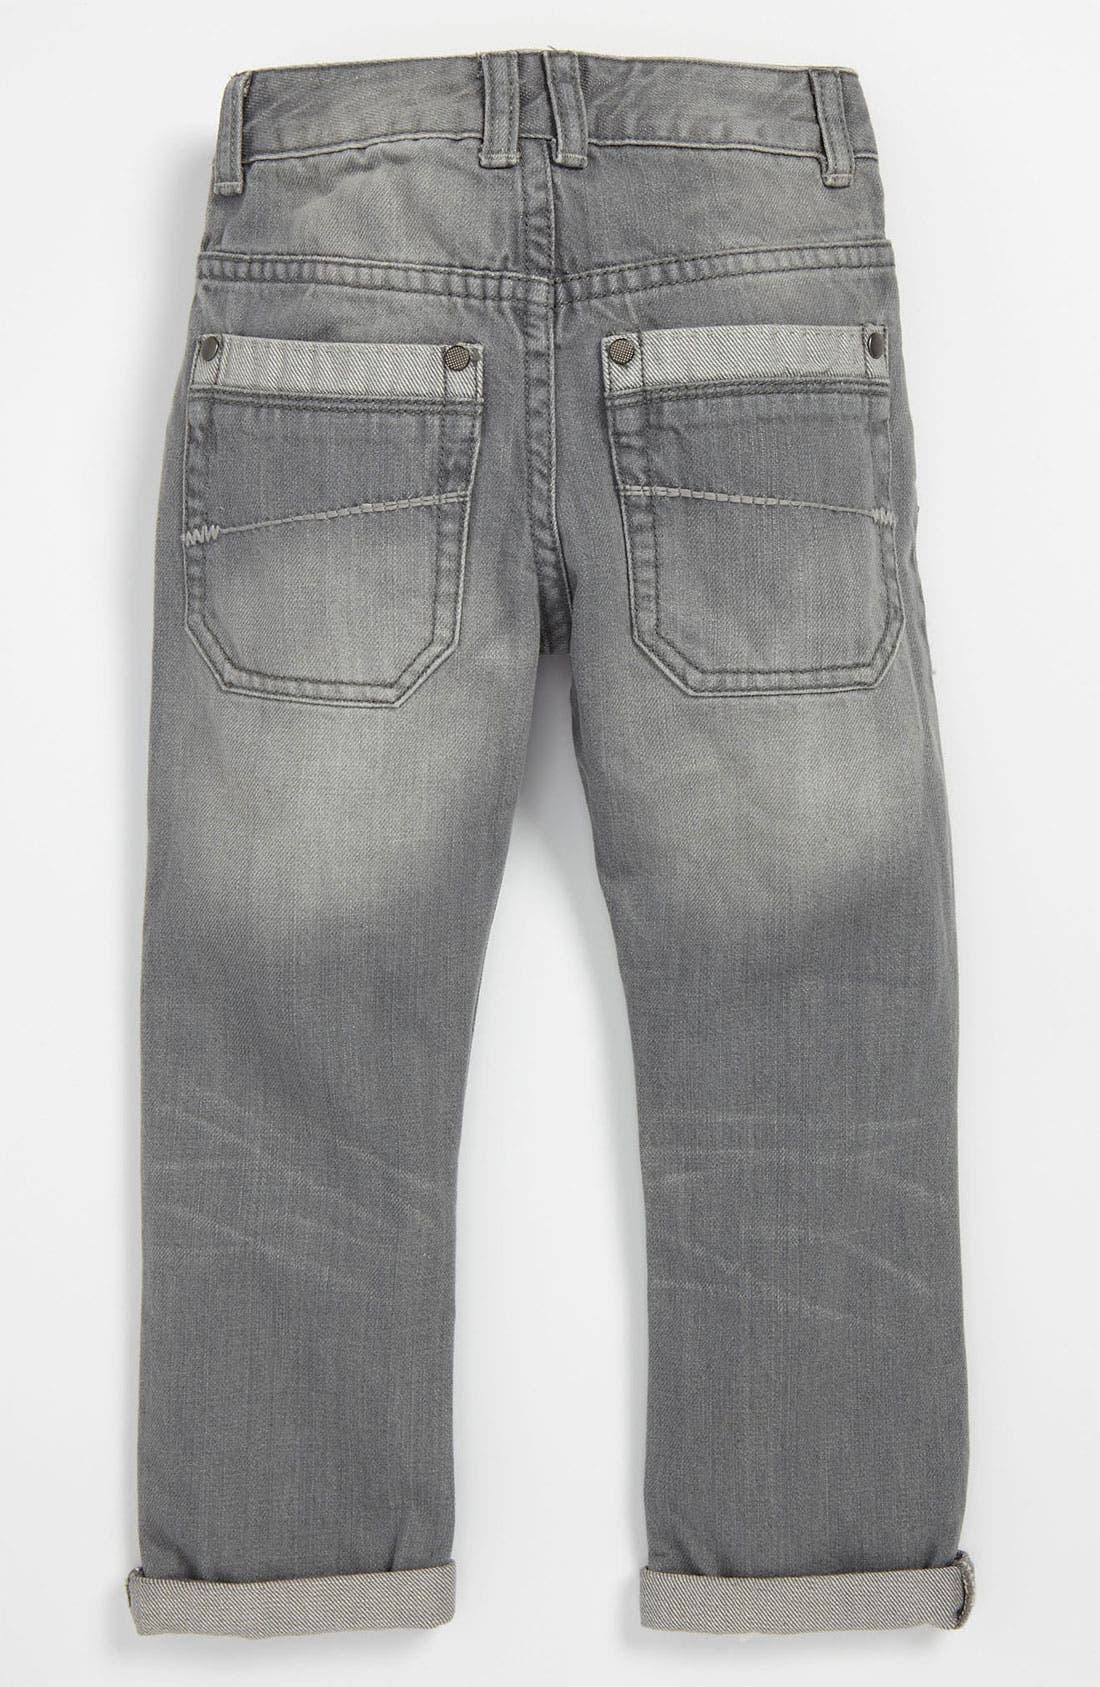 Alternate Image 1 Selected - United Colors of Benetton Kids Skinny Leg Jeans (Infant)